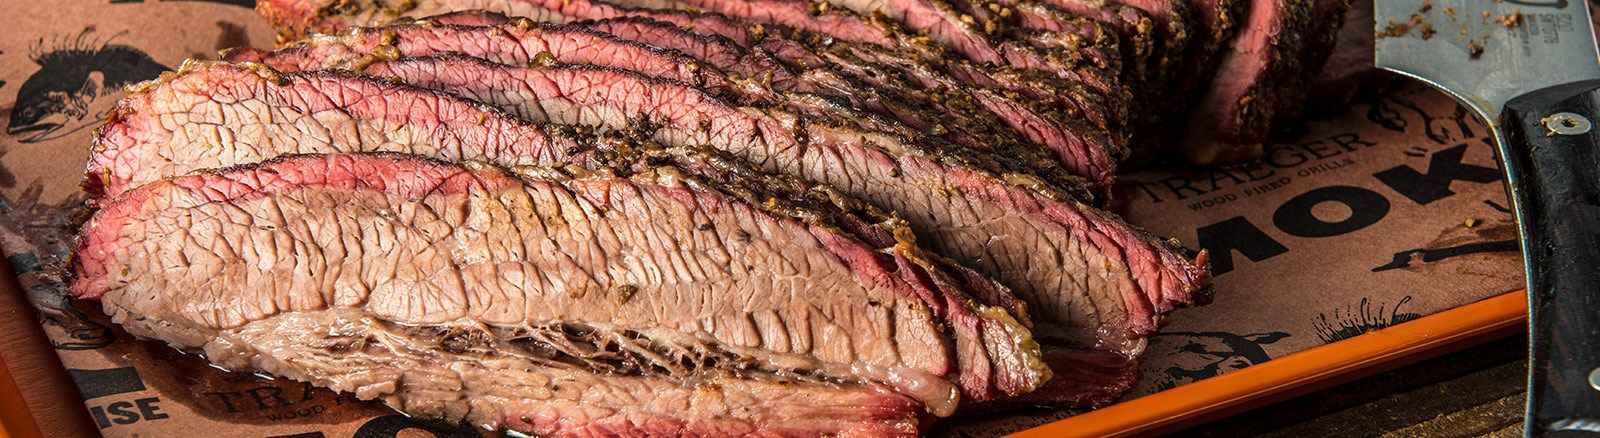 Texas Style BBQ Brisket by Doug Scheiding Difficulty4/5